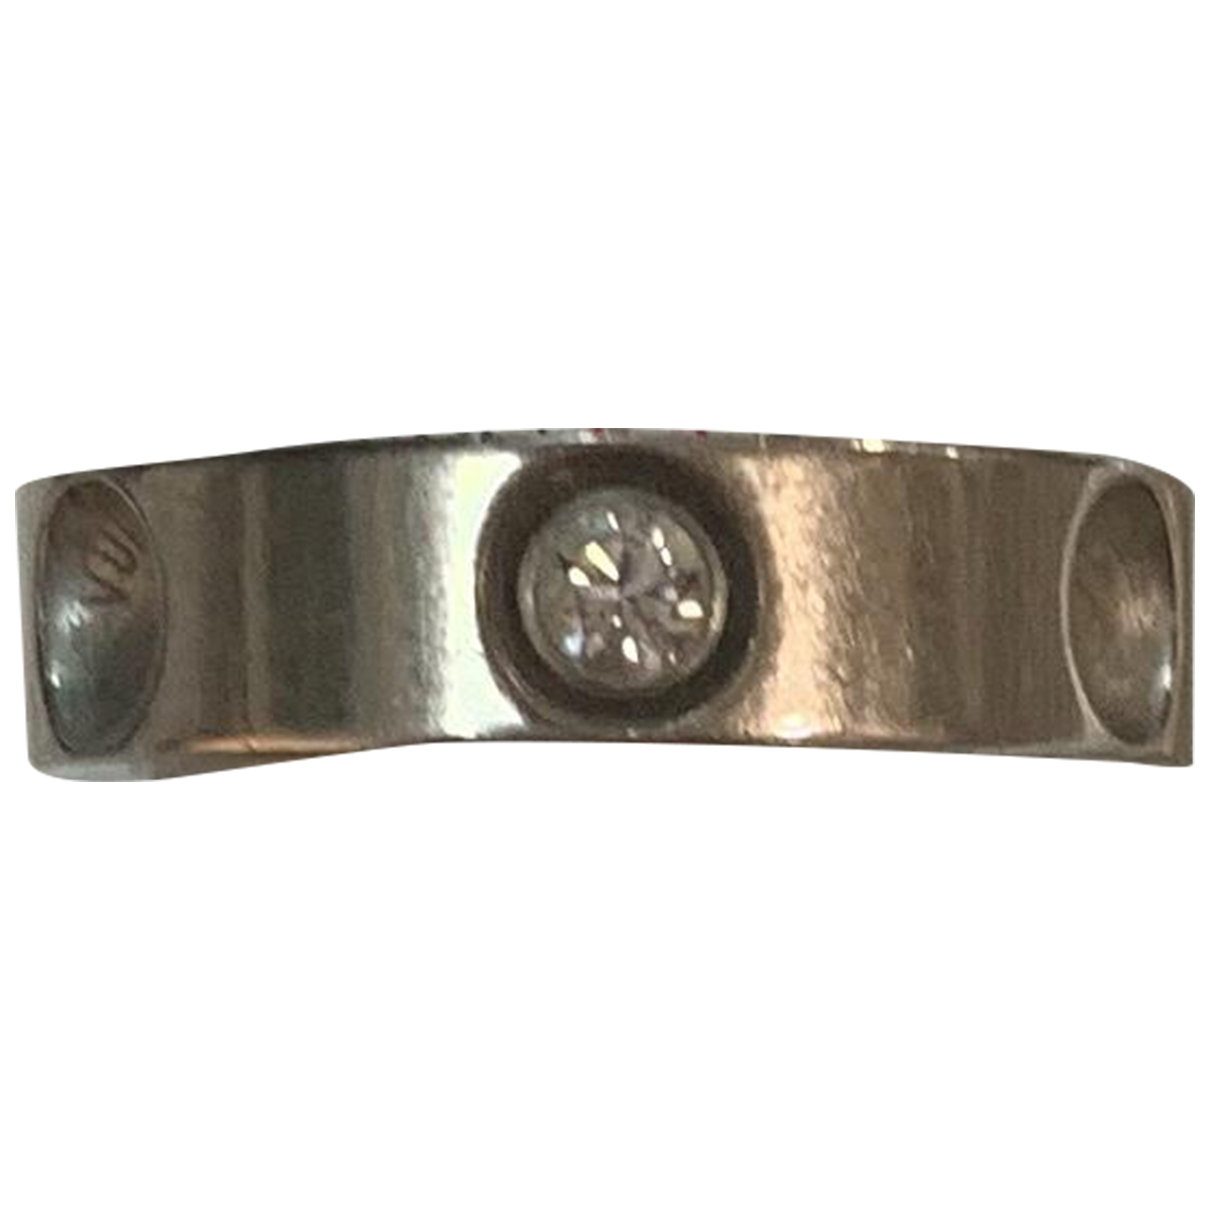 Louis Vuitton \N Ring in  Weiss Weissgold